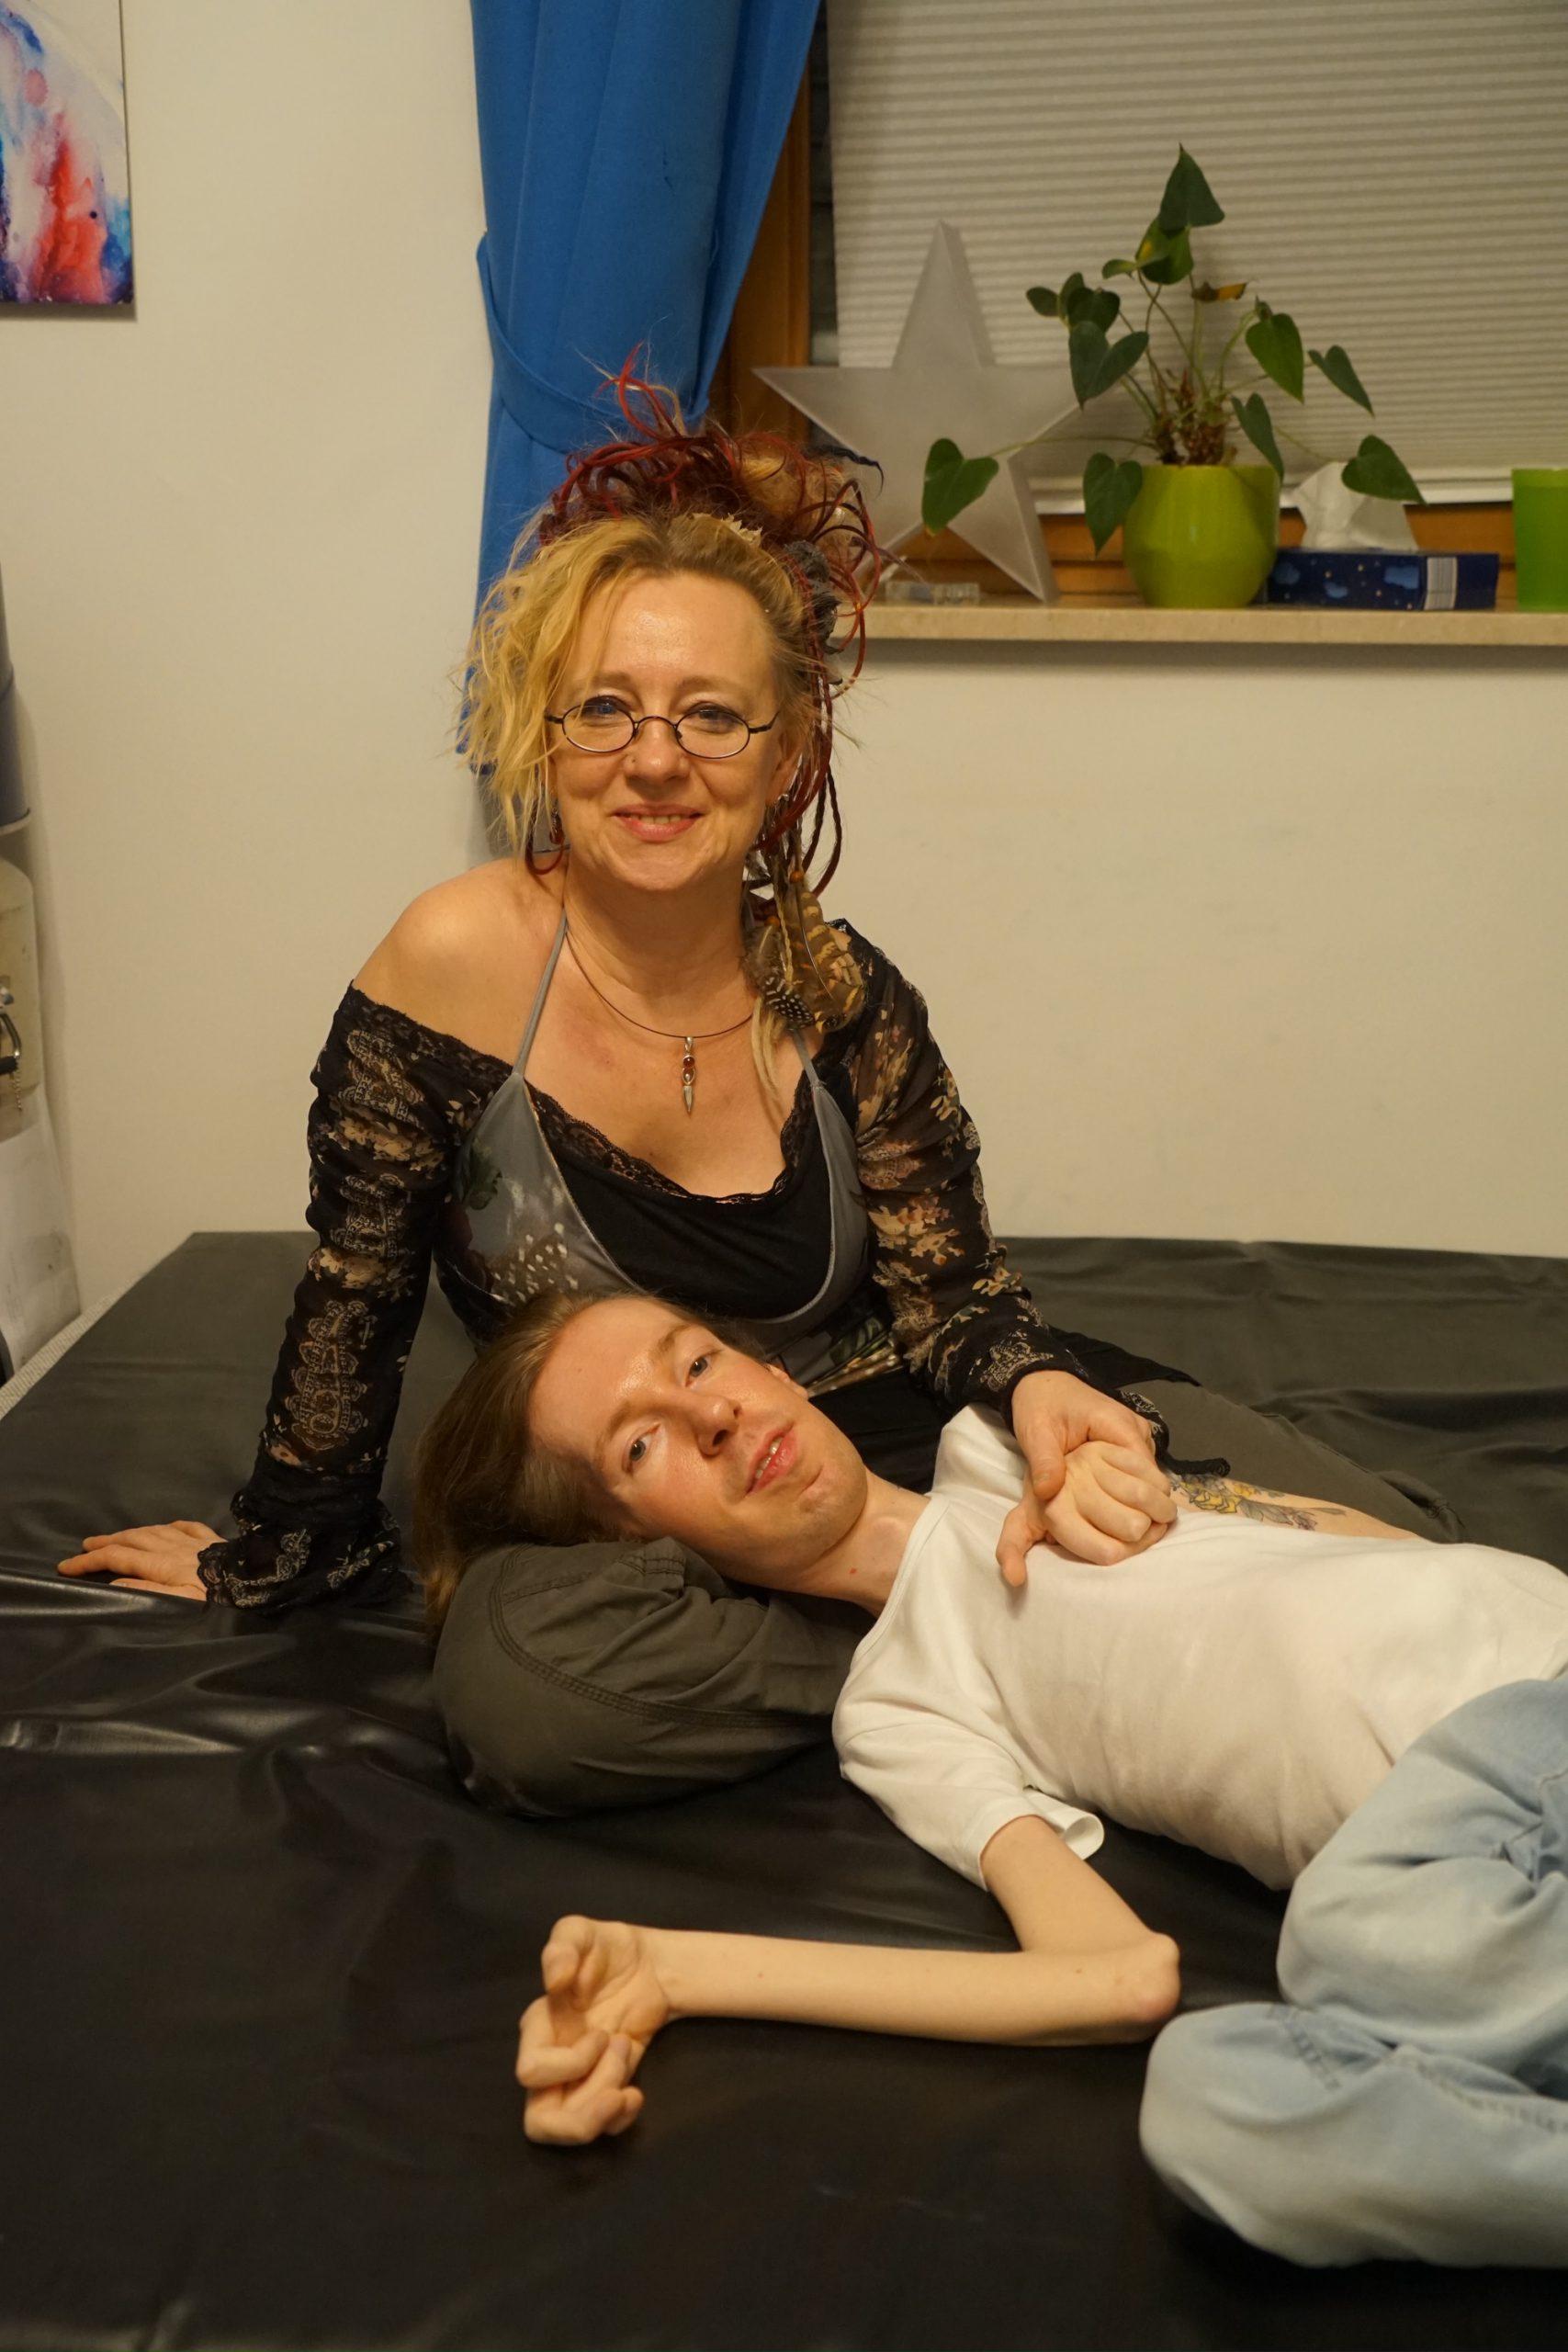 Handicap-Passion – BDSM oder Tantra? SMantra!